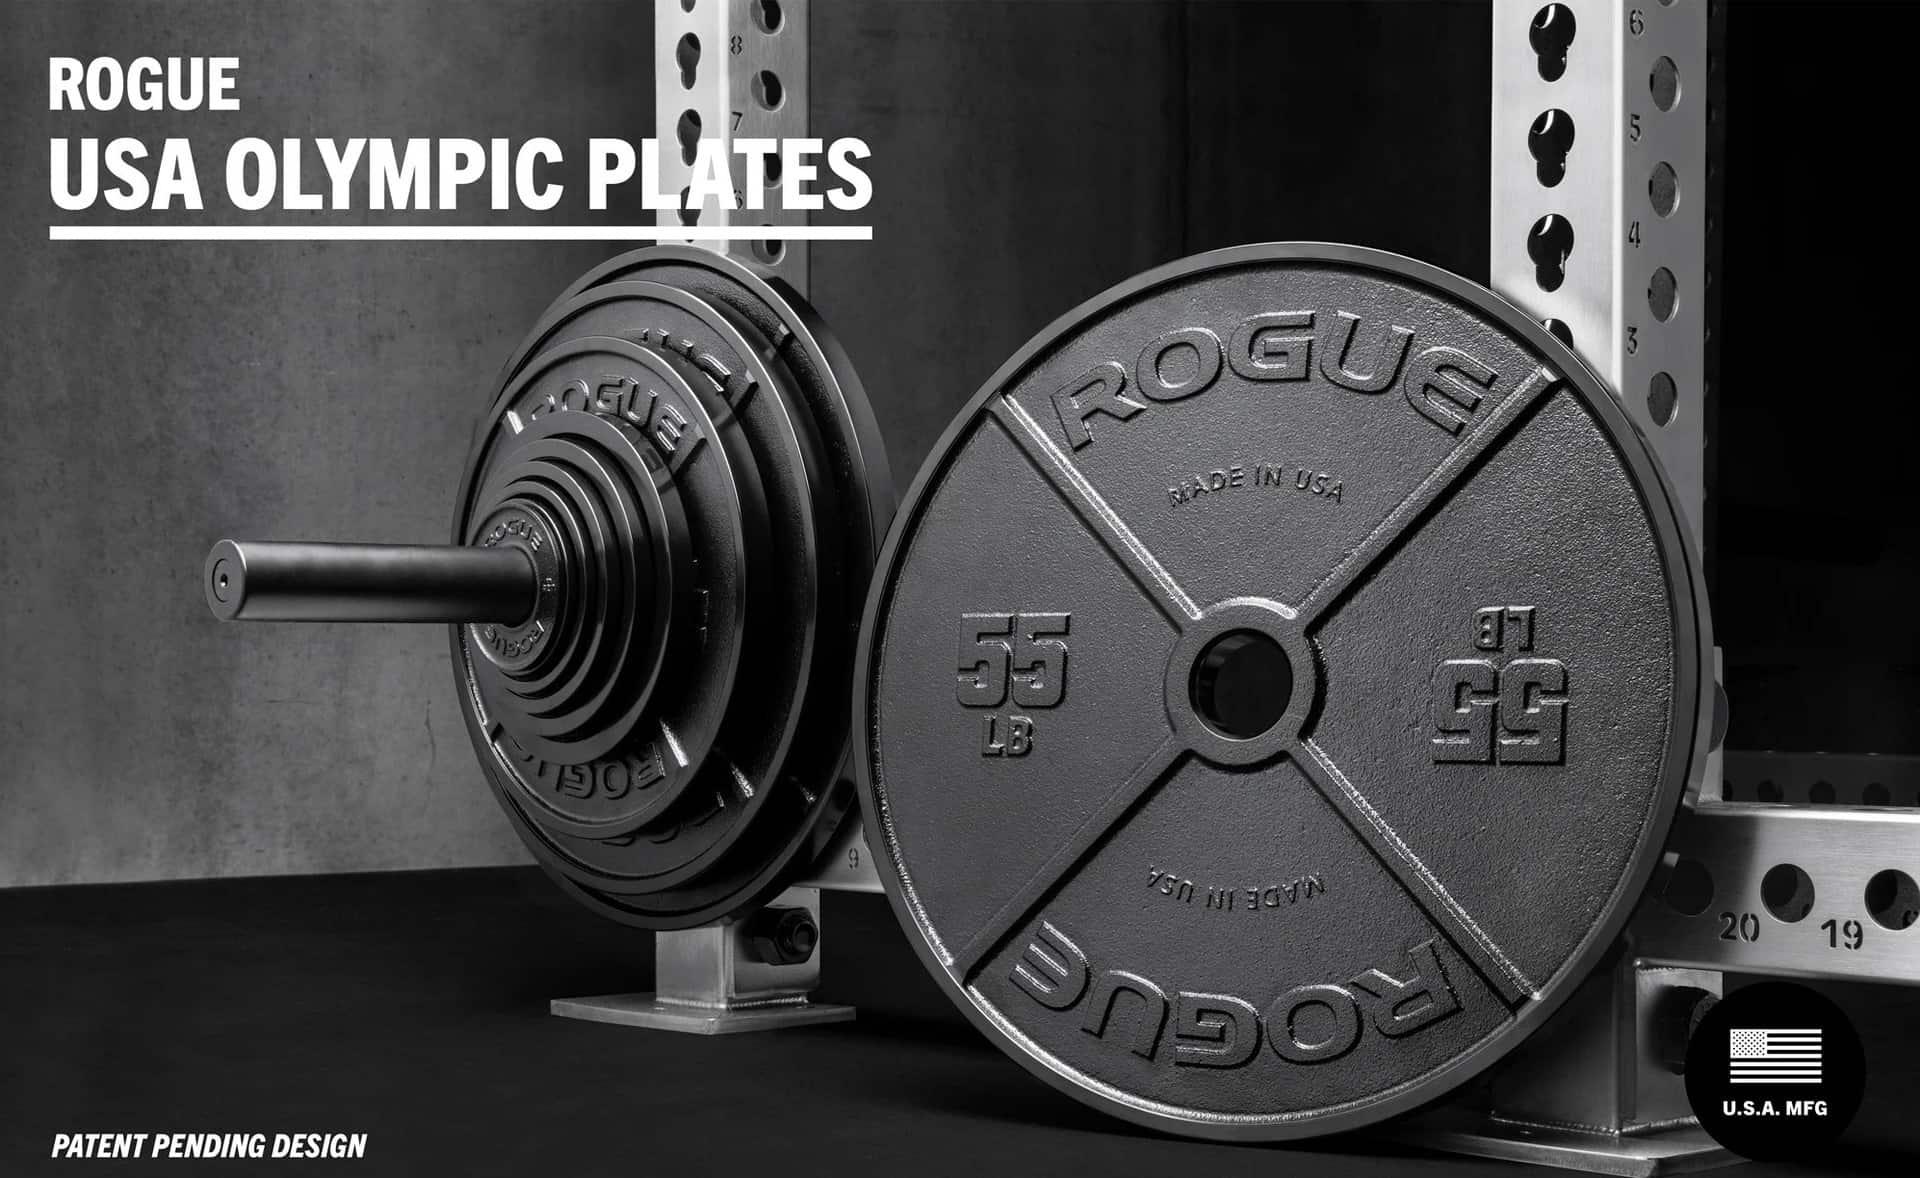 Rogue USA Olympic Plates main